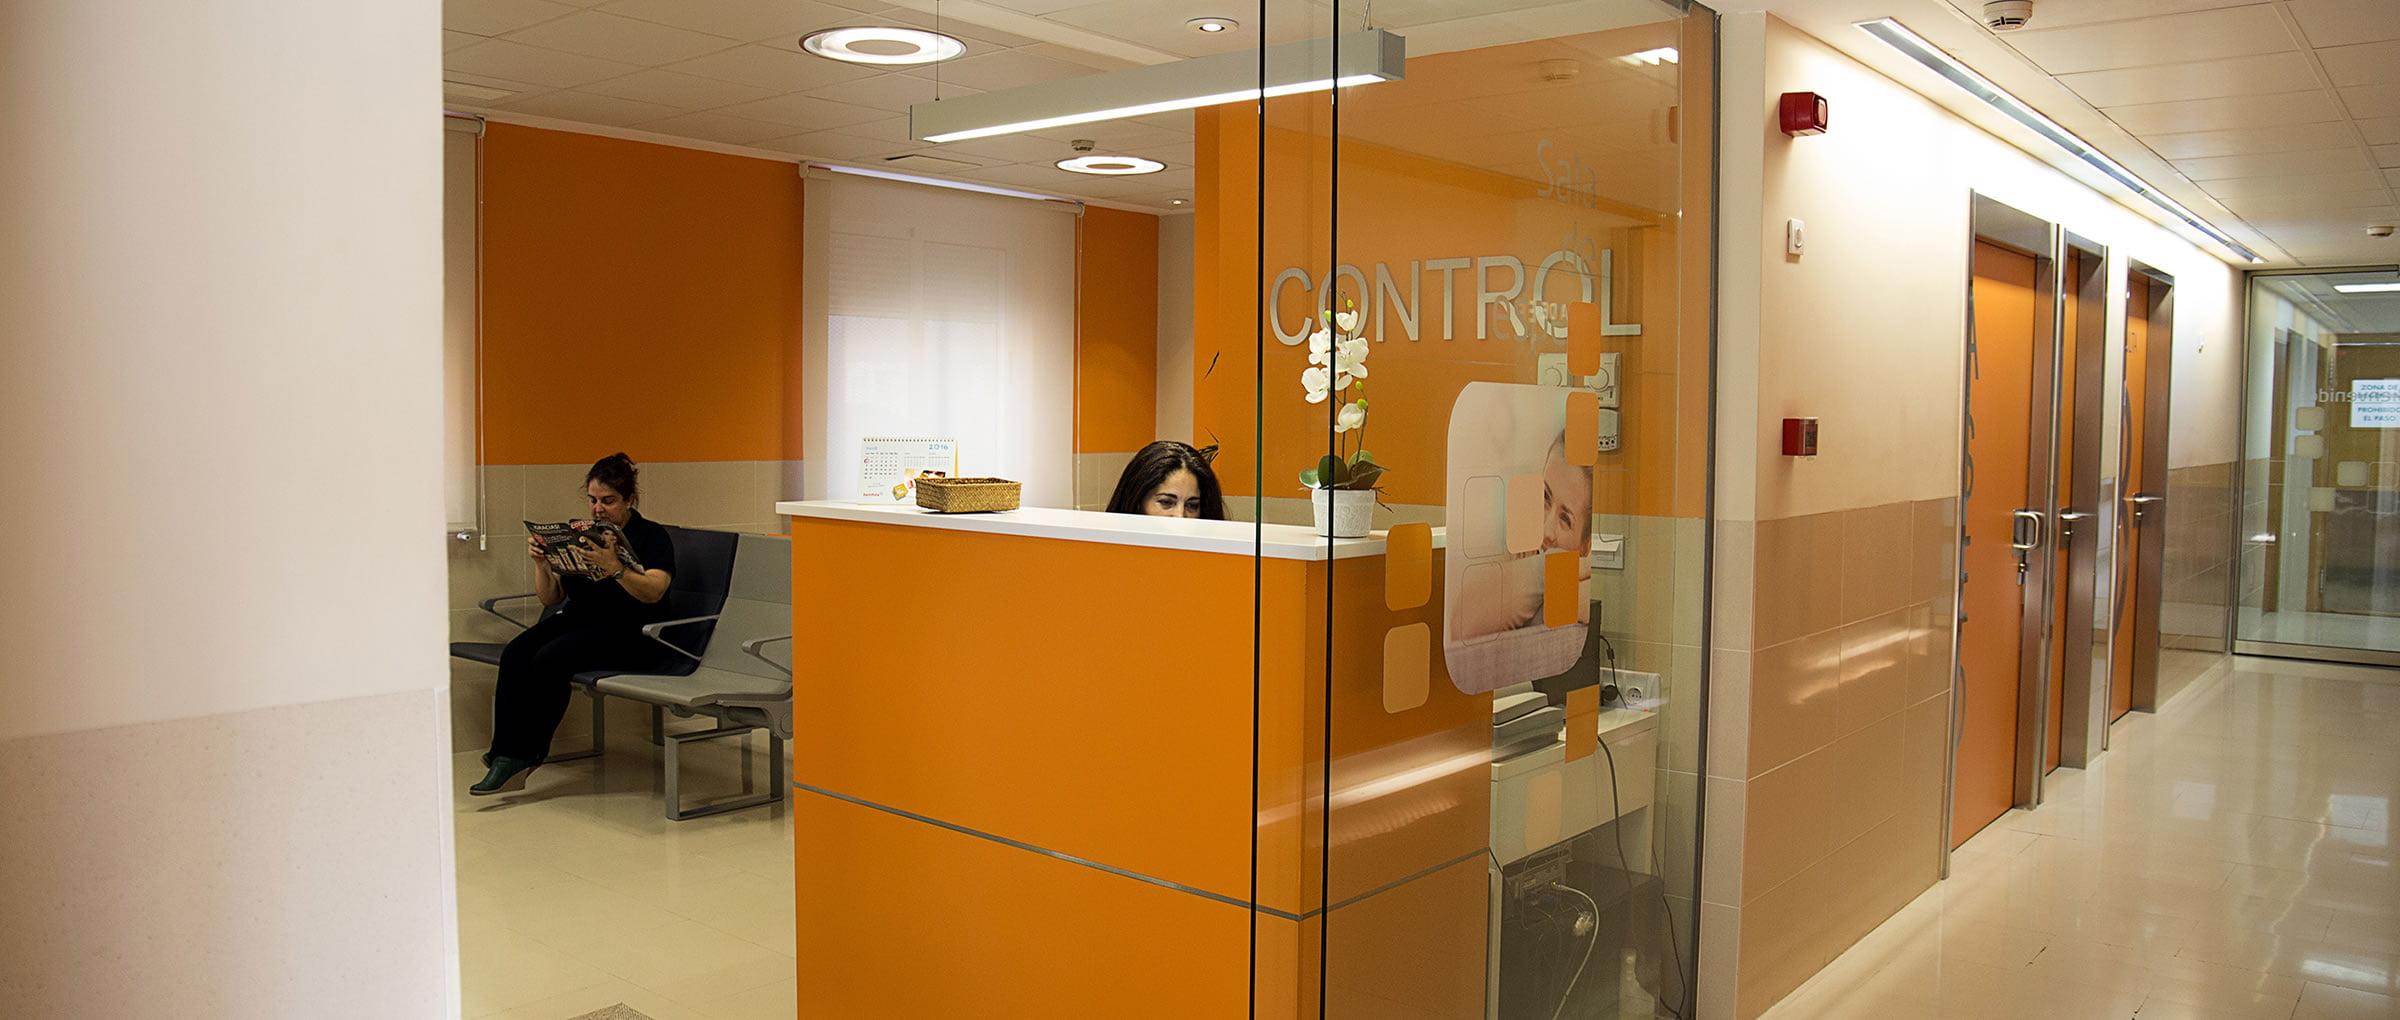 Unidad Phi Fertility Center reception